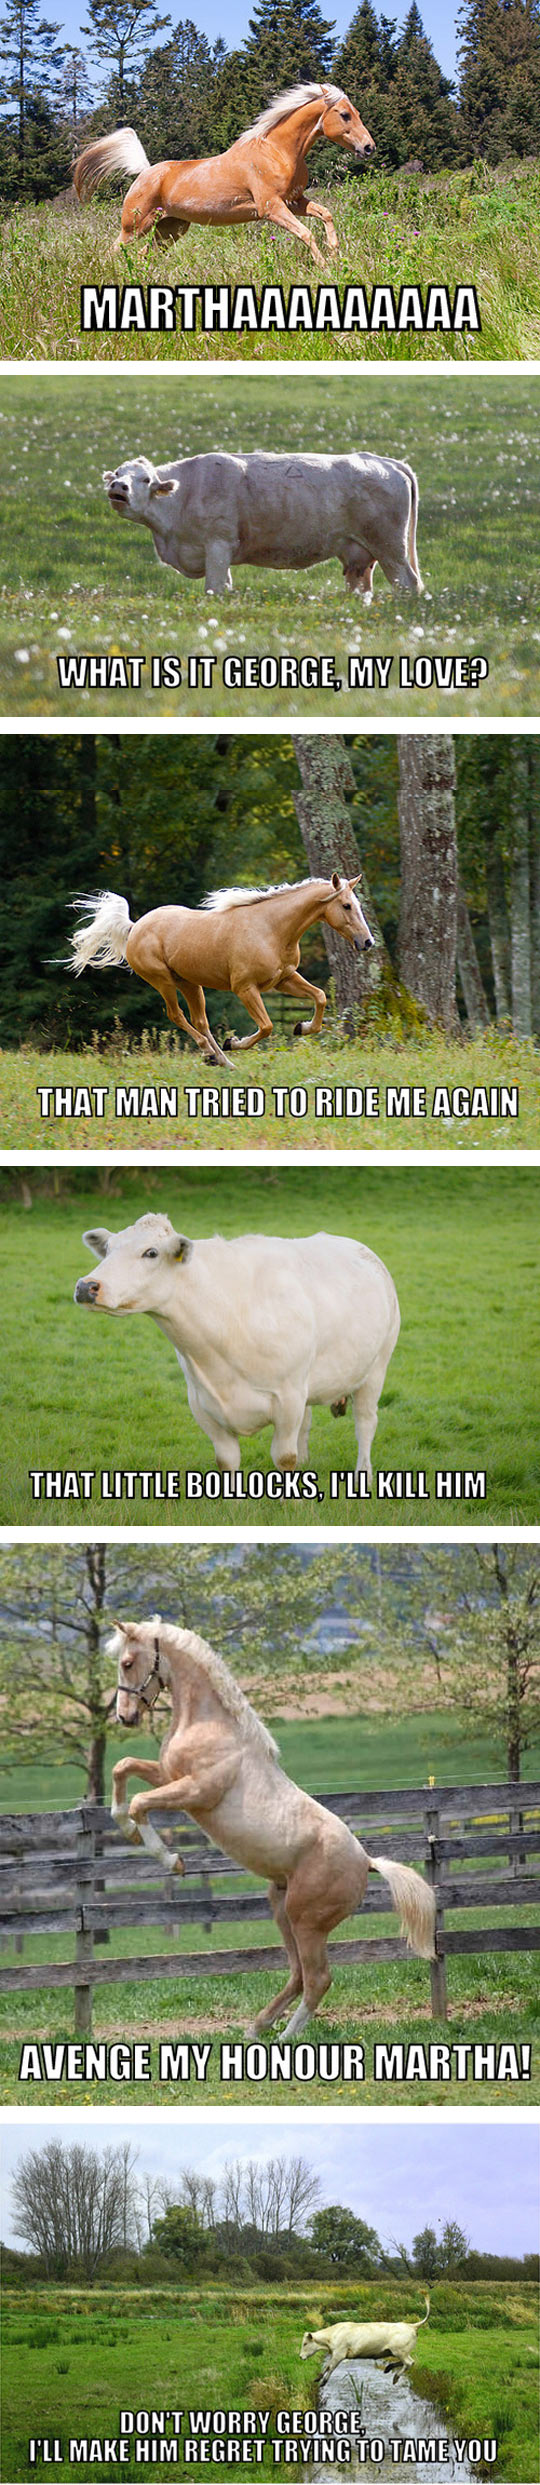 funny-horse-cow-field-farm